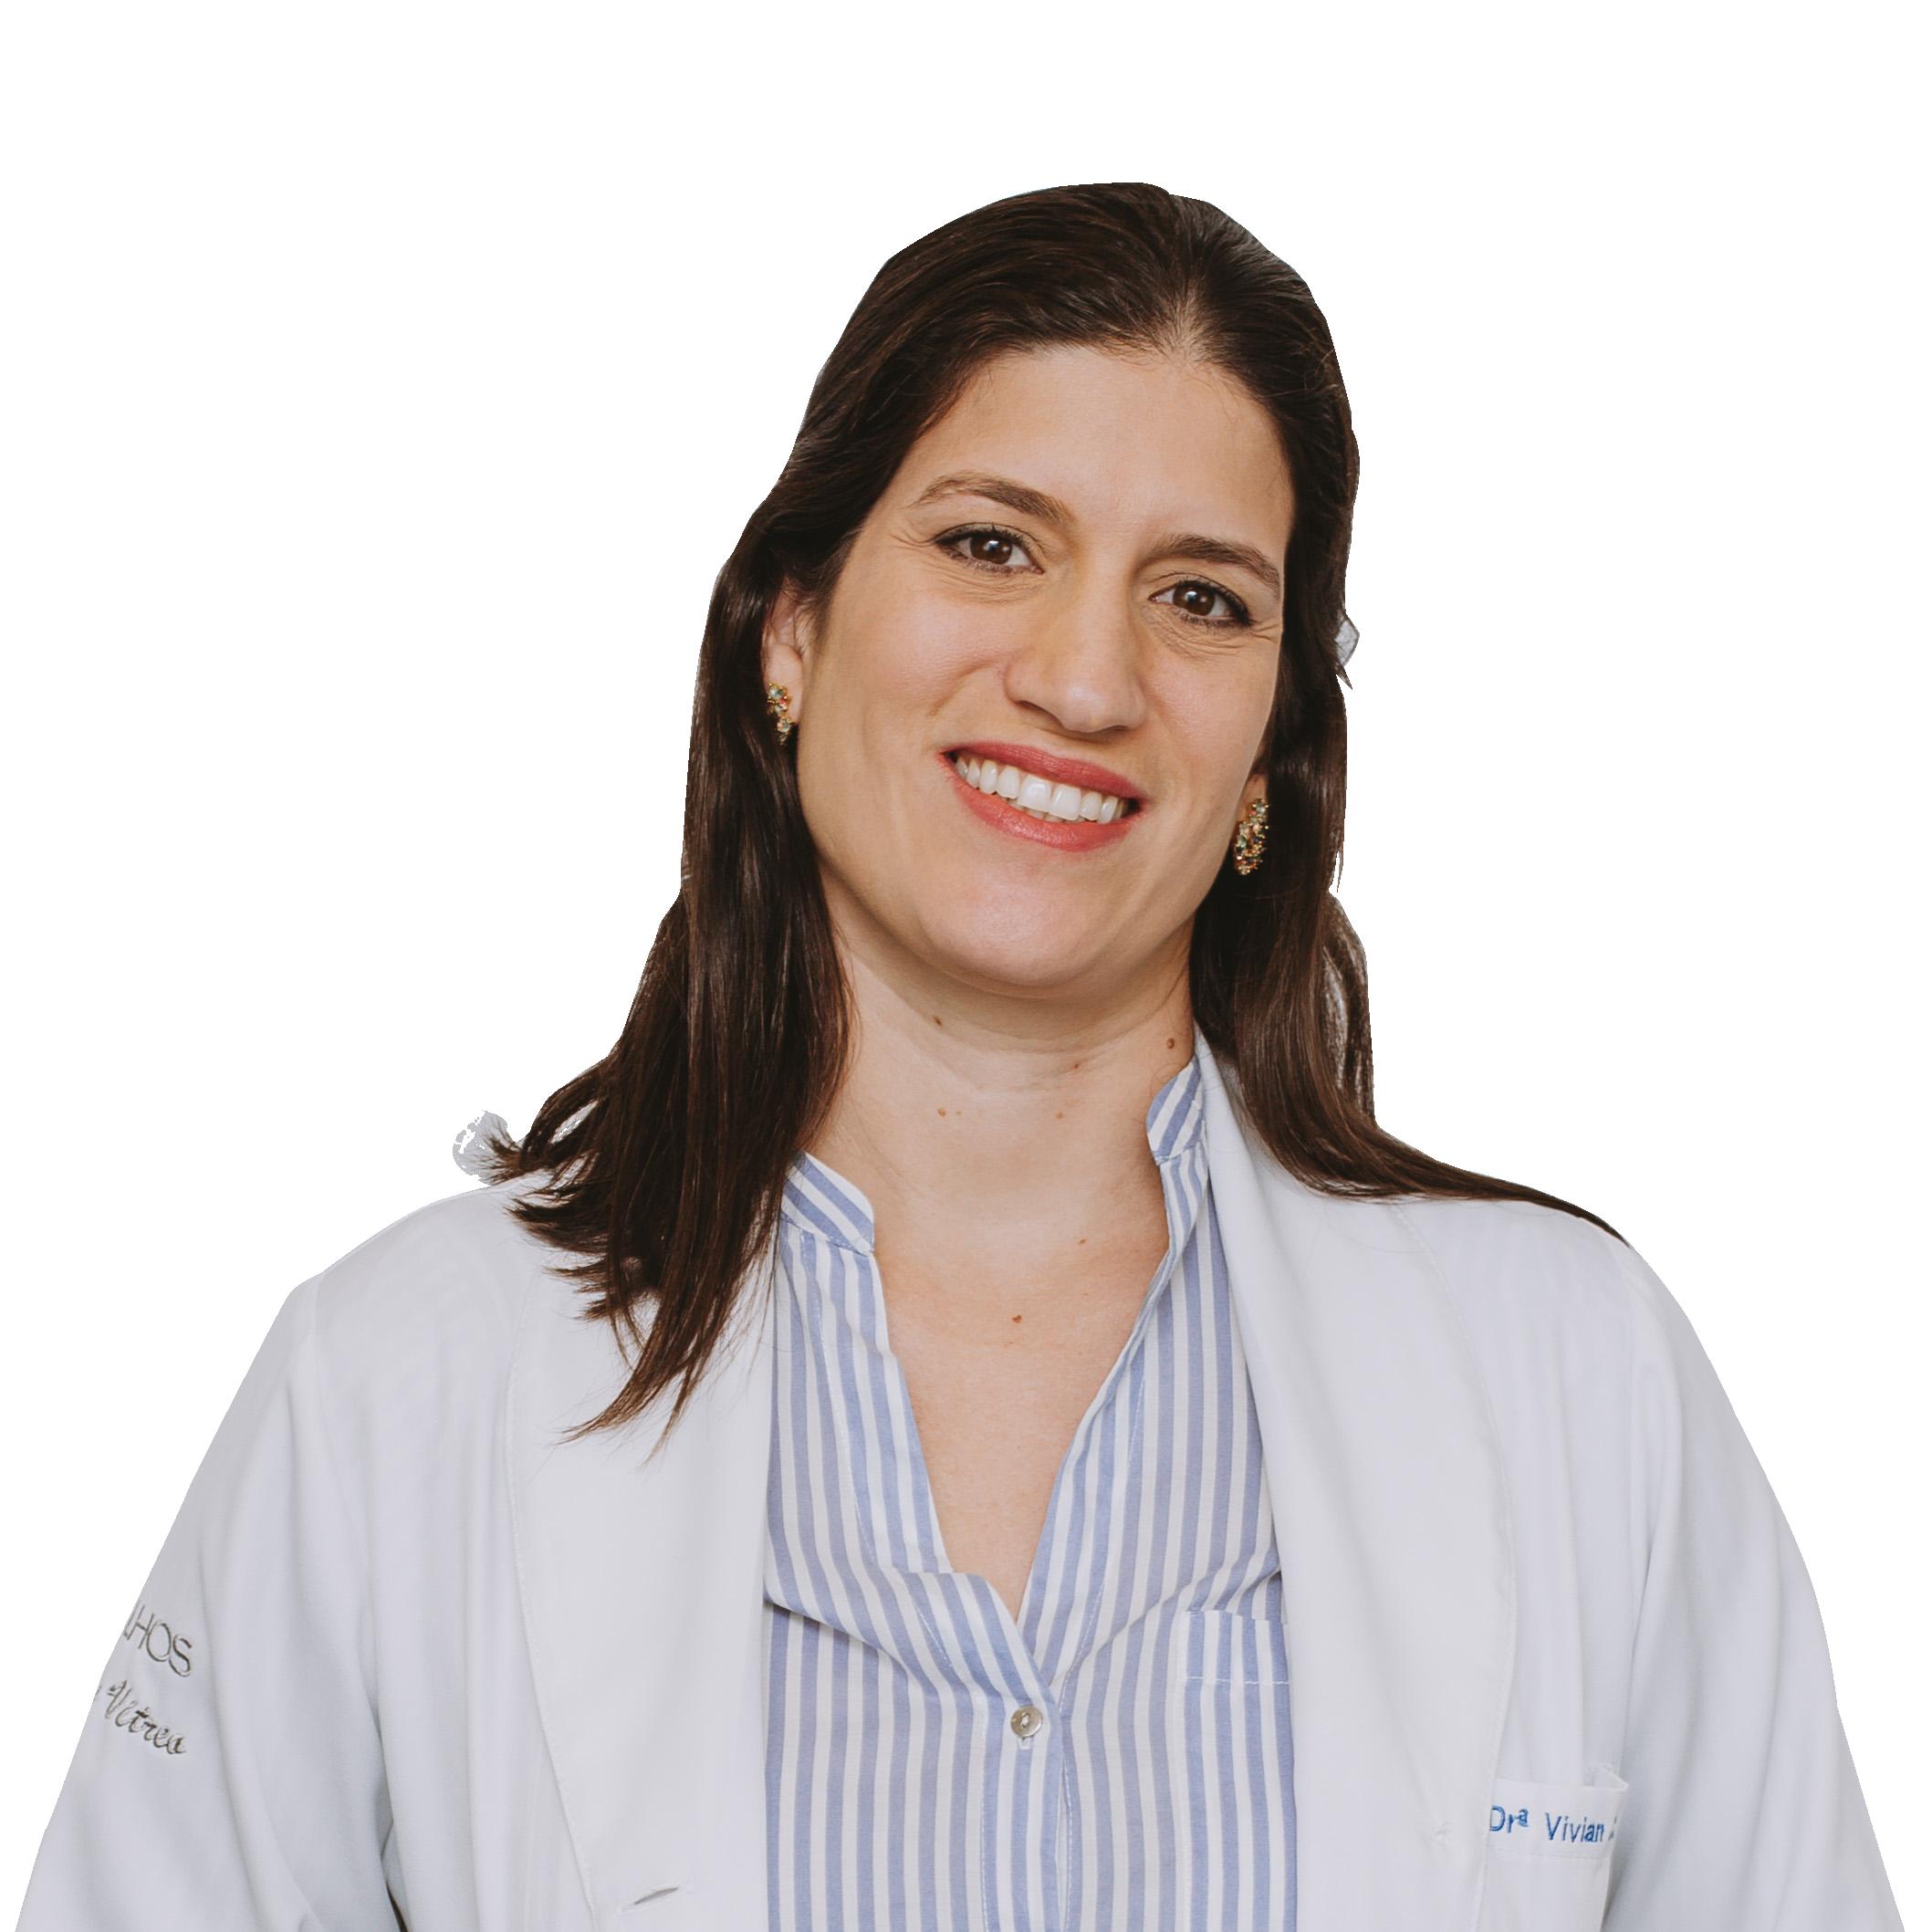 Dra. Vivian Saes - D'Olhos Hospital Dia